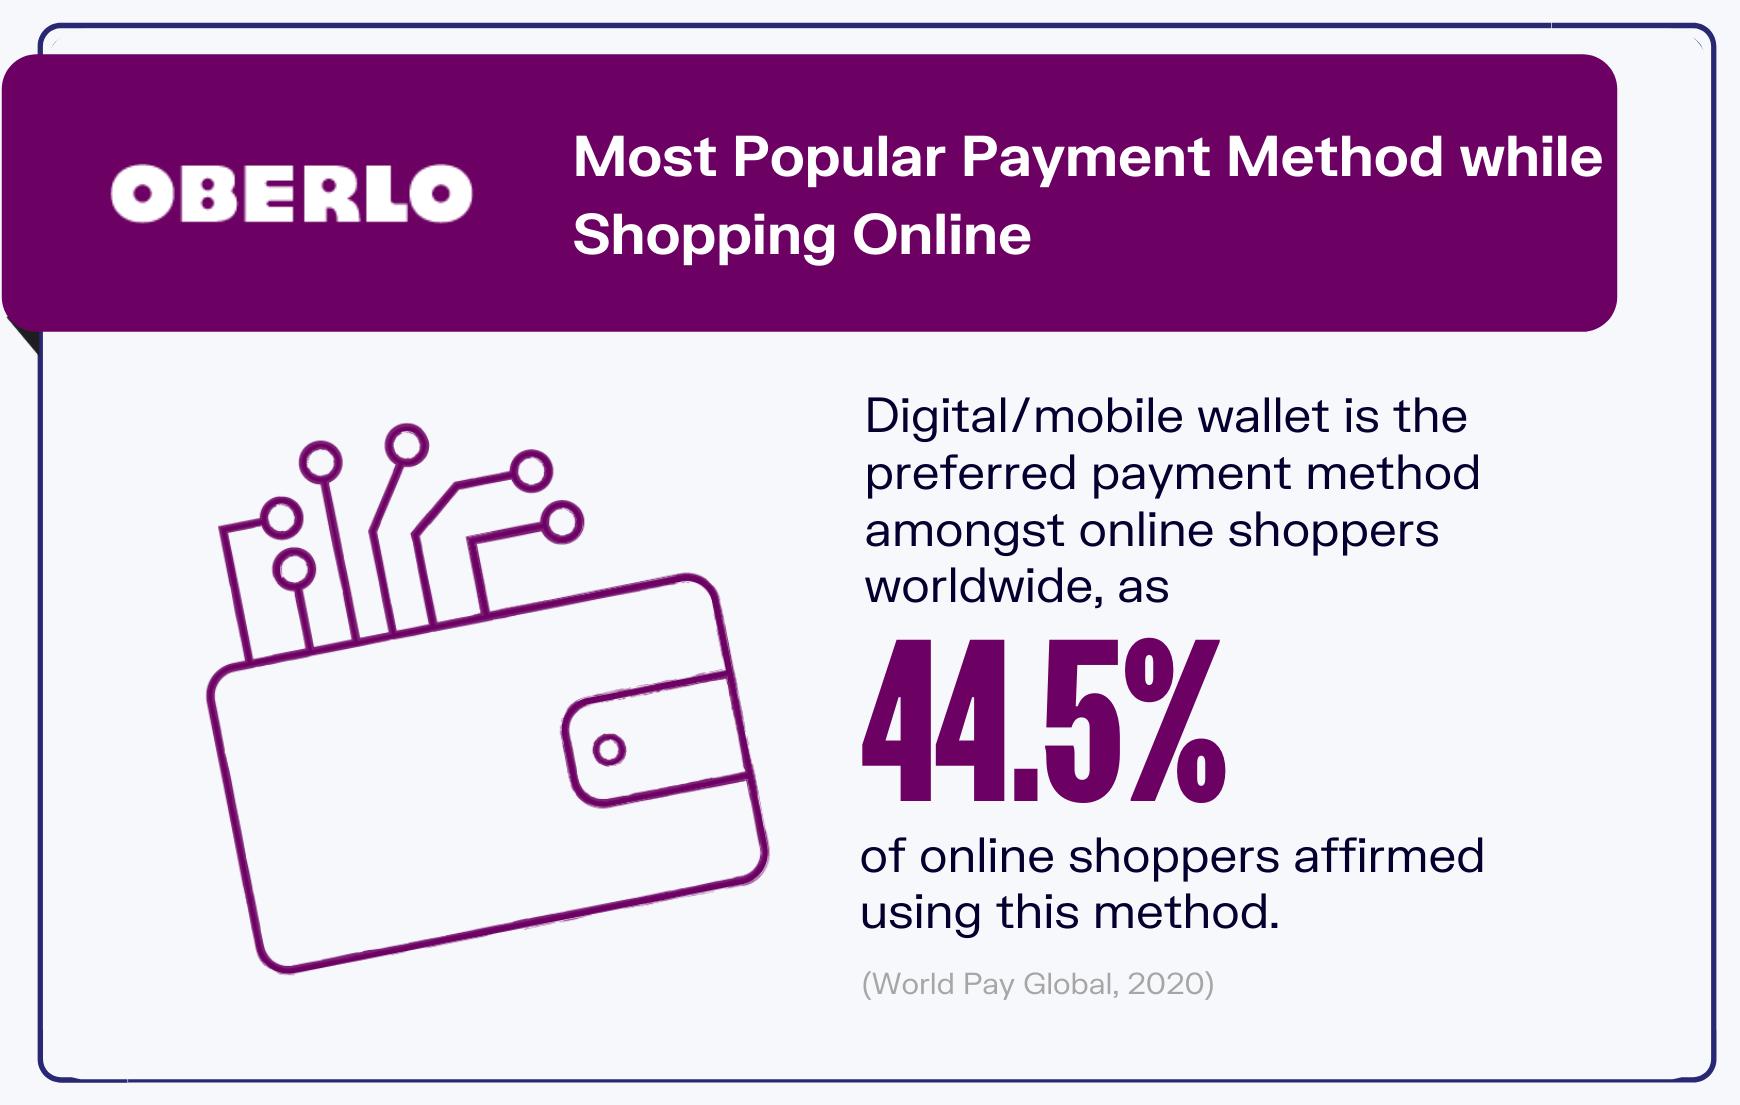 online shopping statistics graphic 5